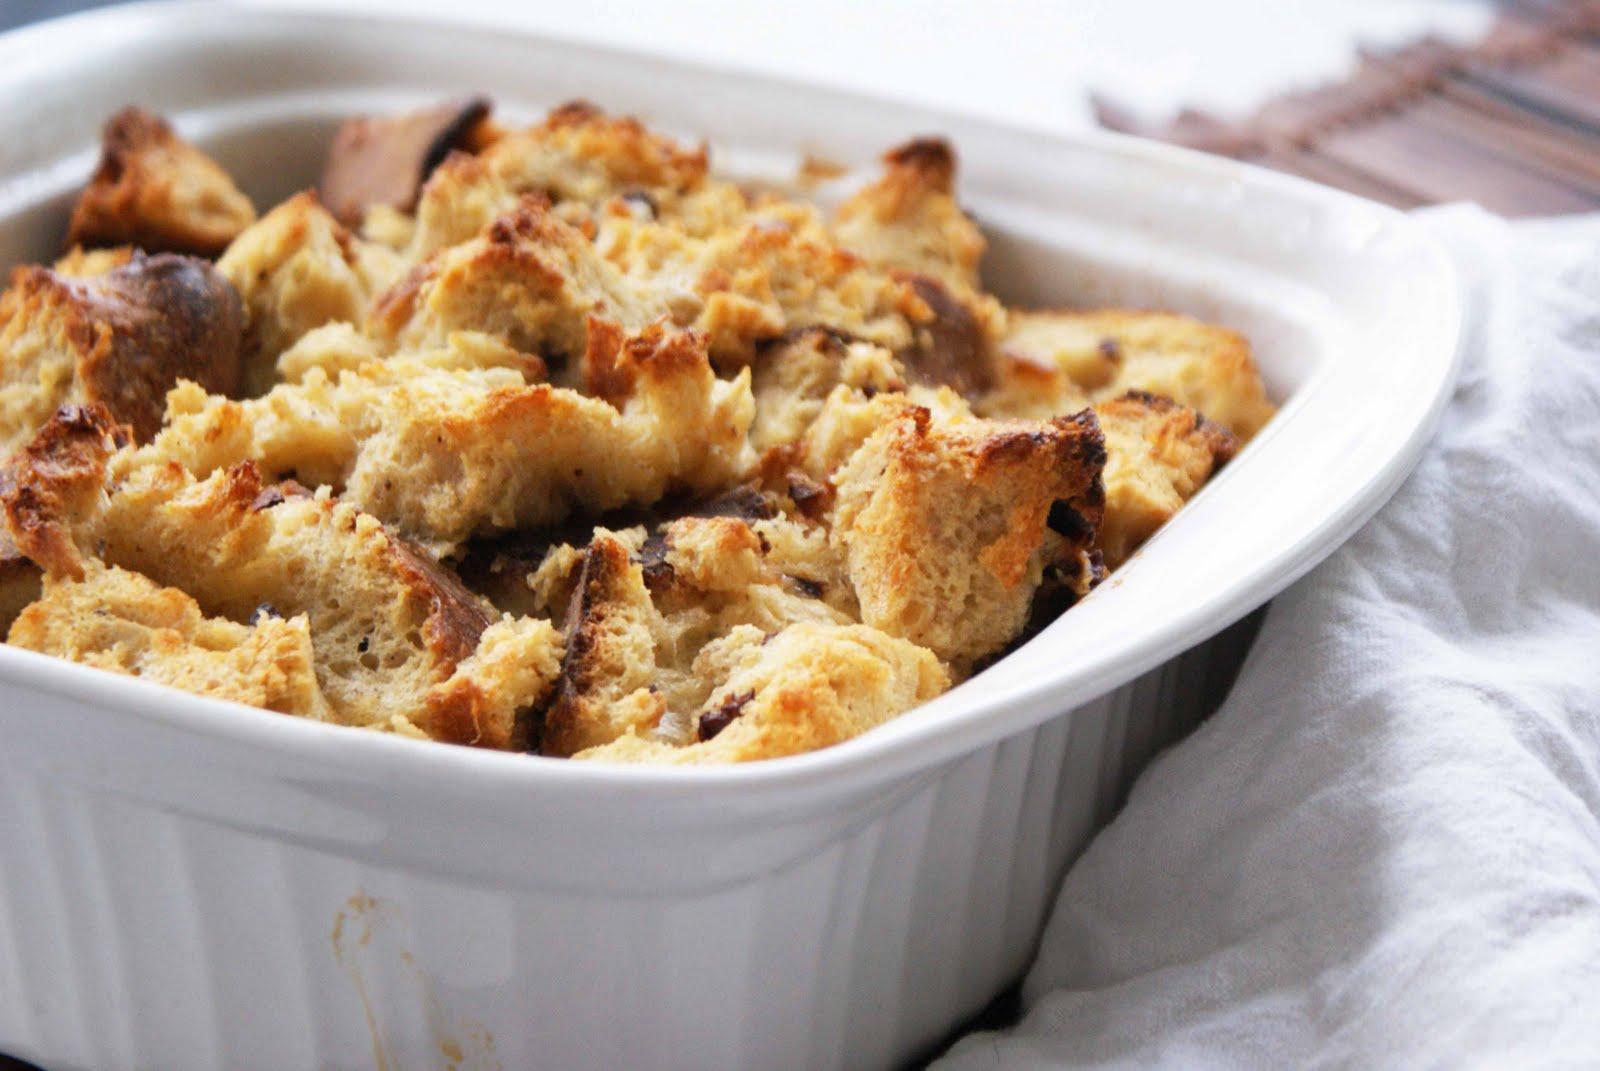 Raisin+eggnog+Bread+pudding+2